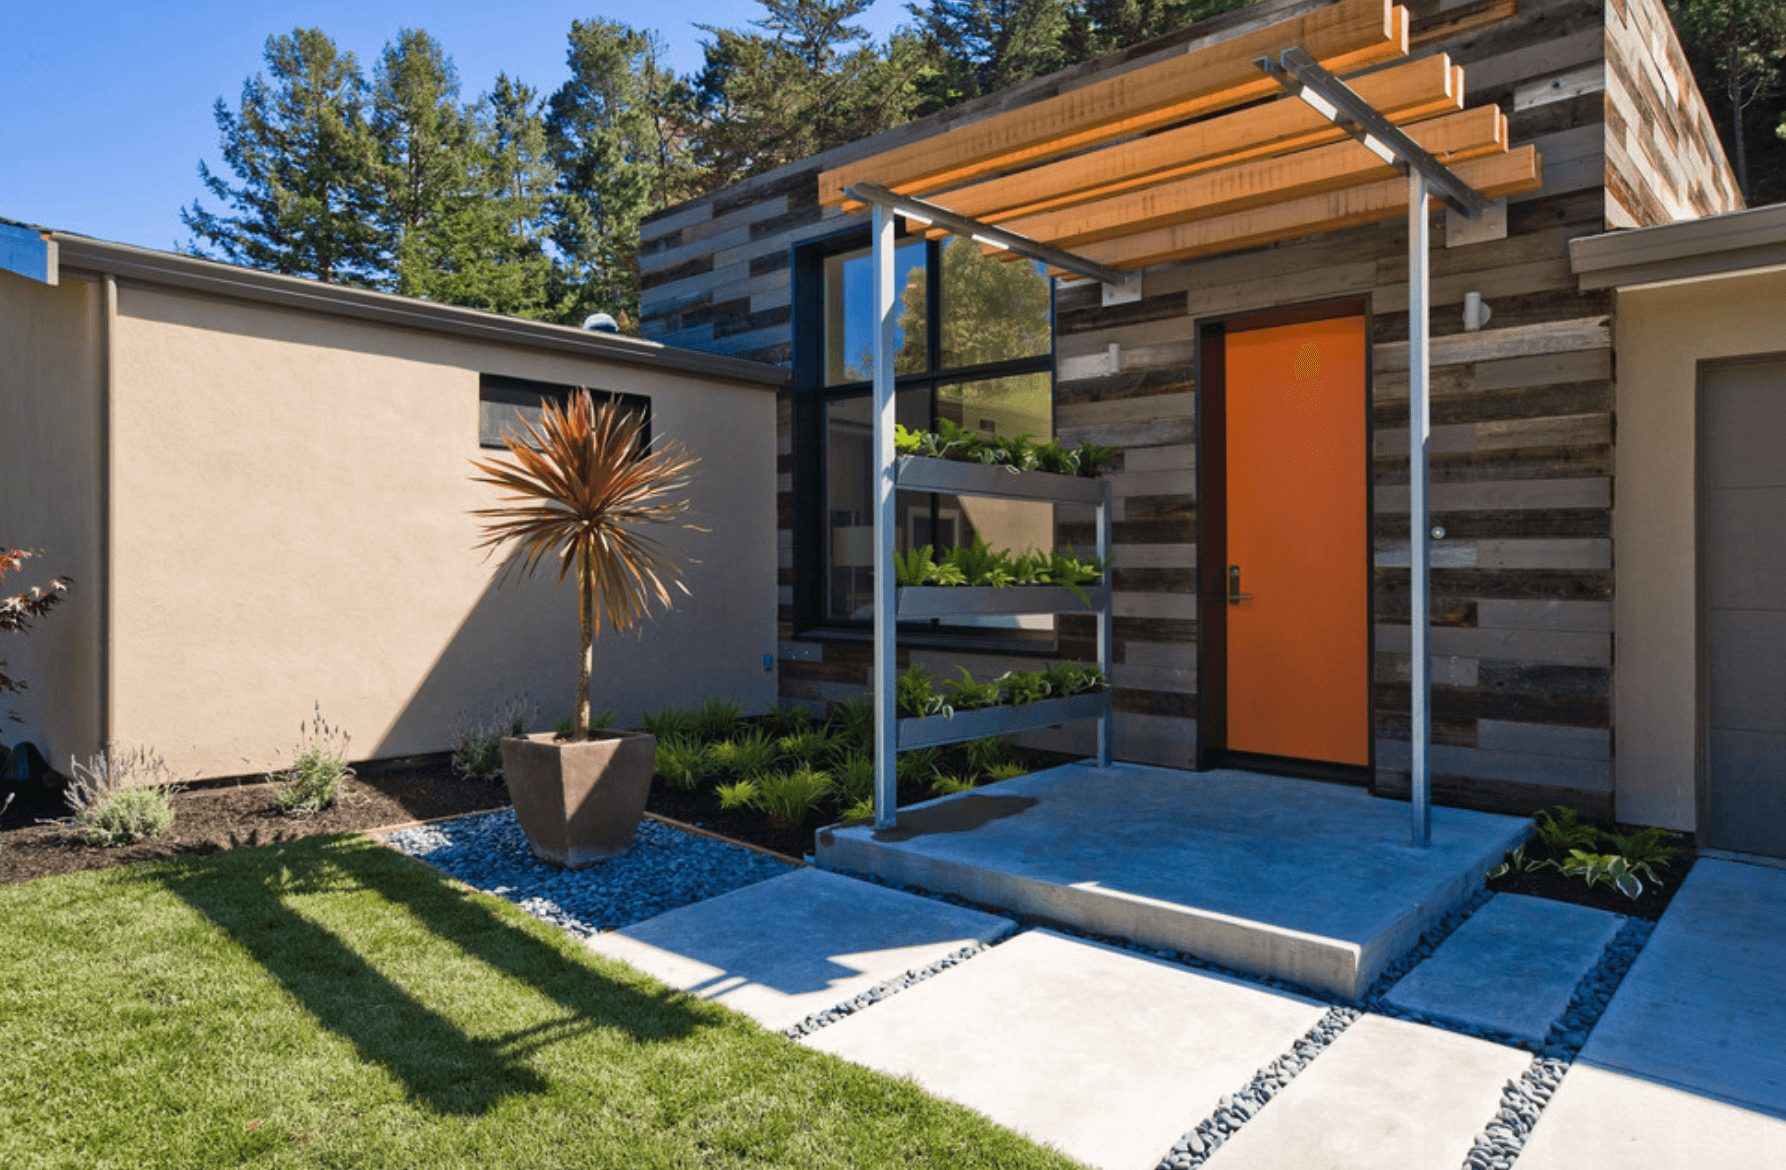 Casas bonitas de madeira